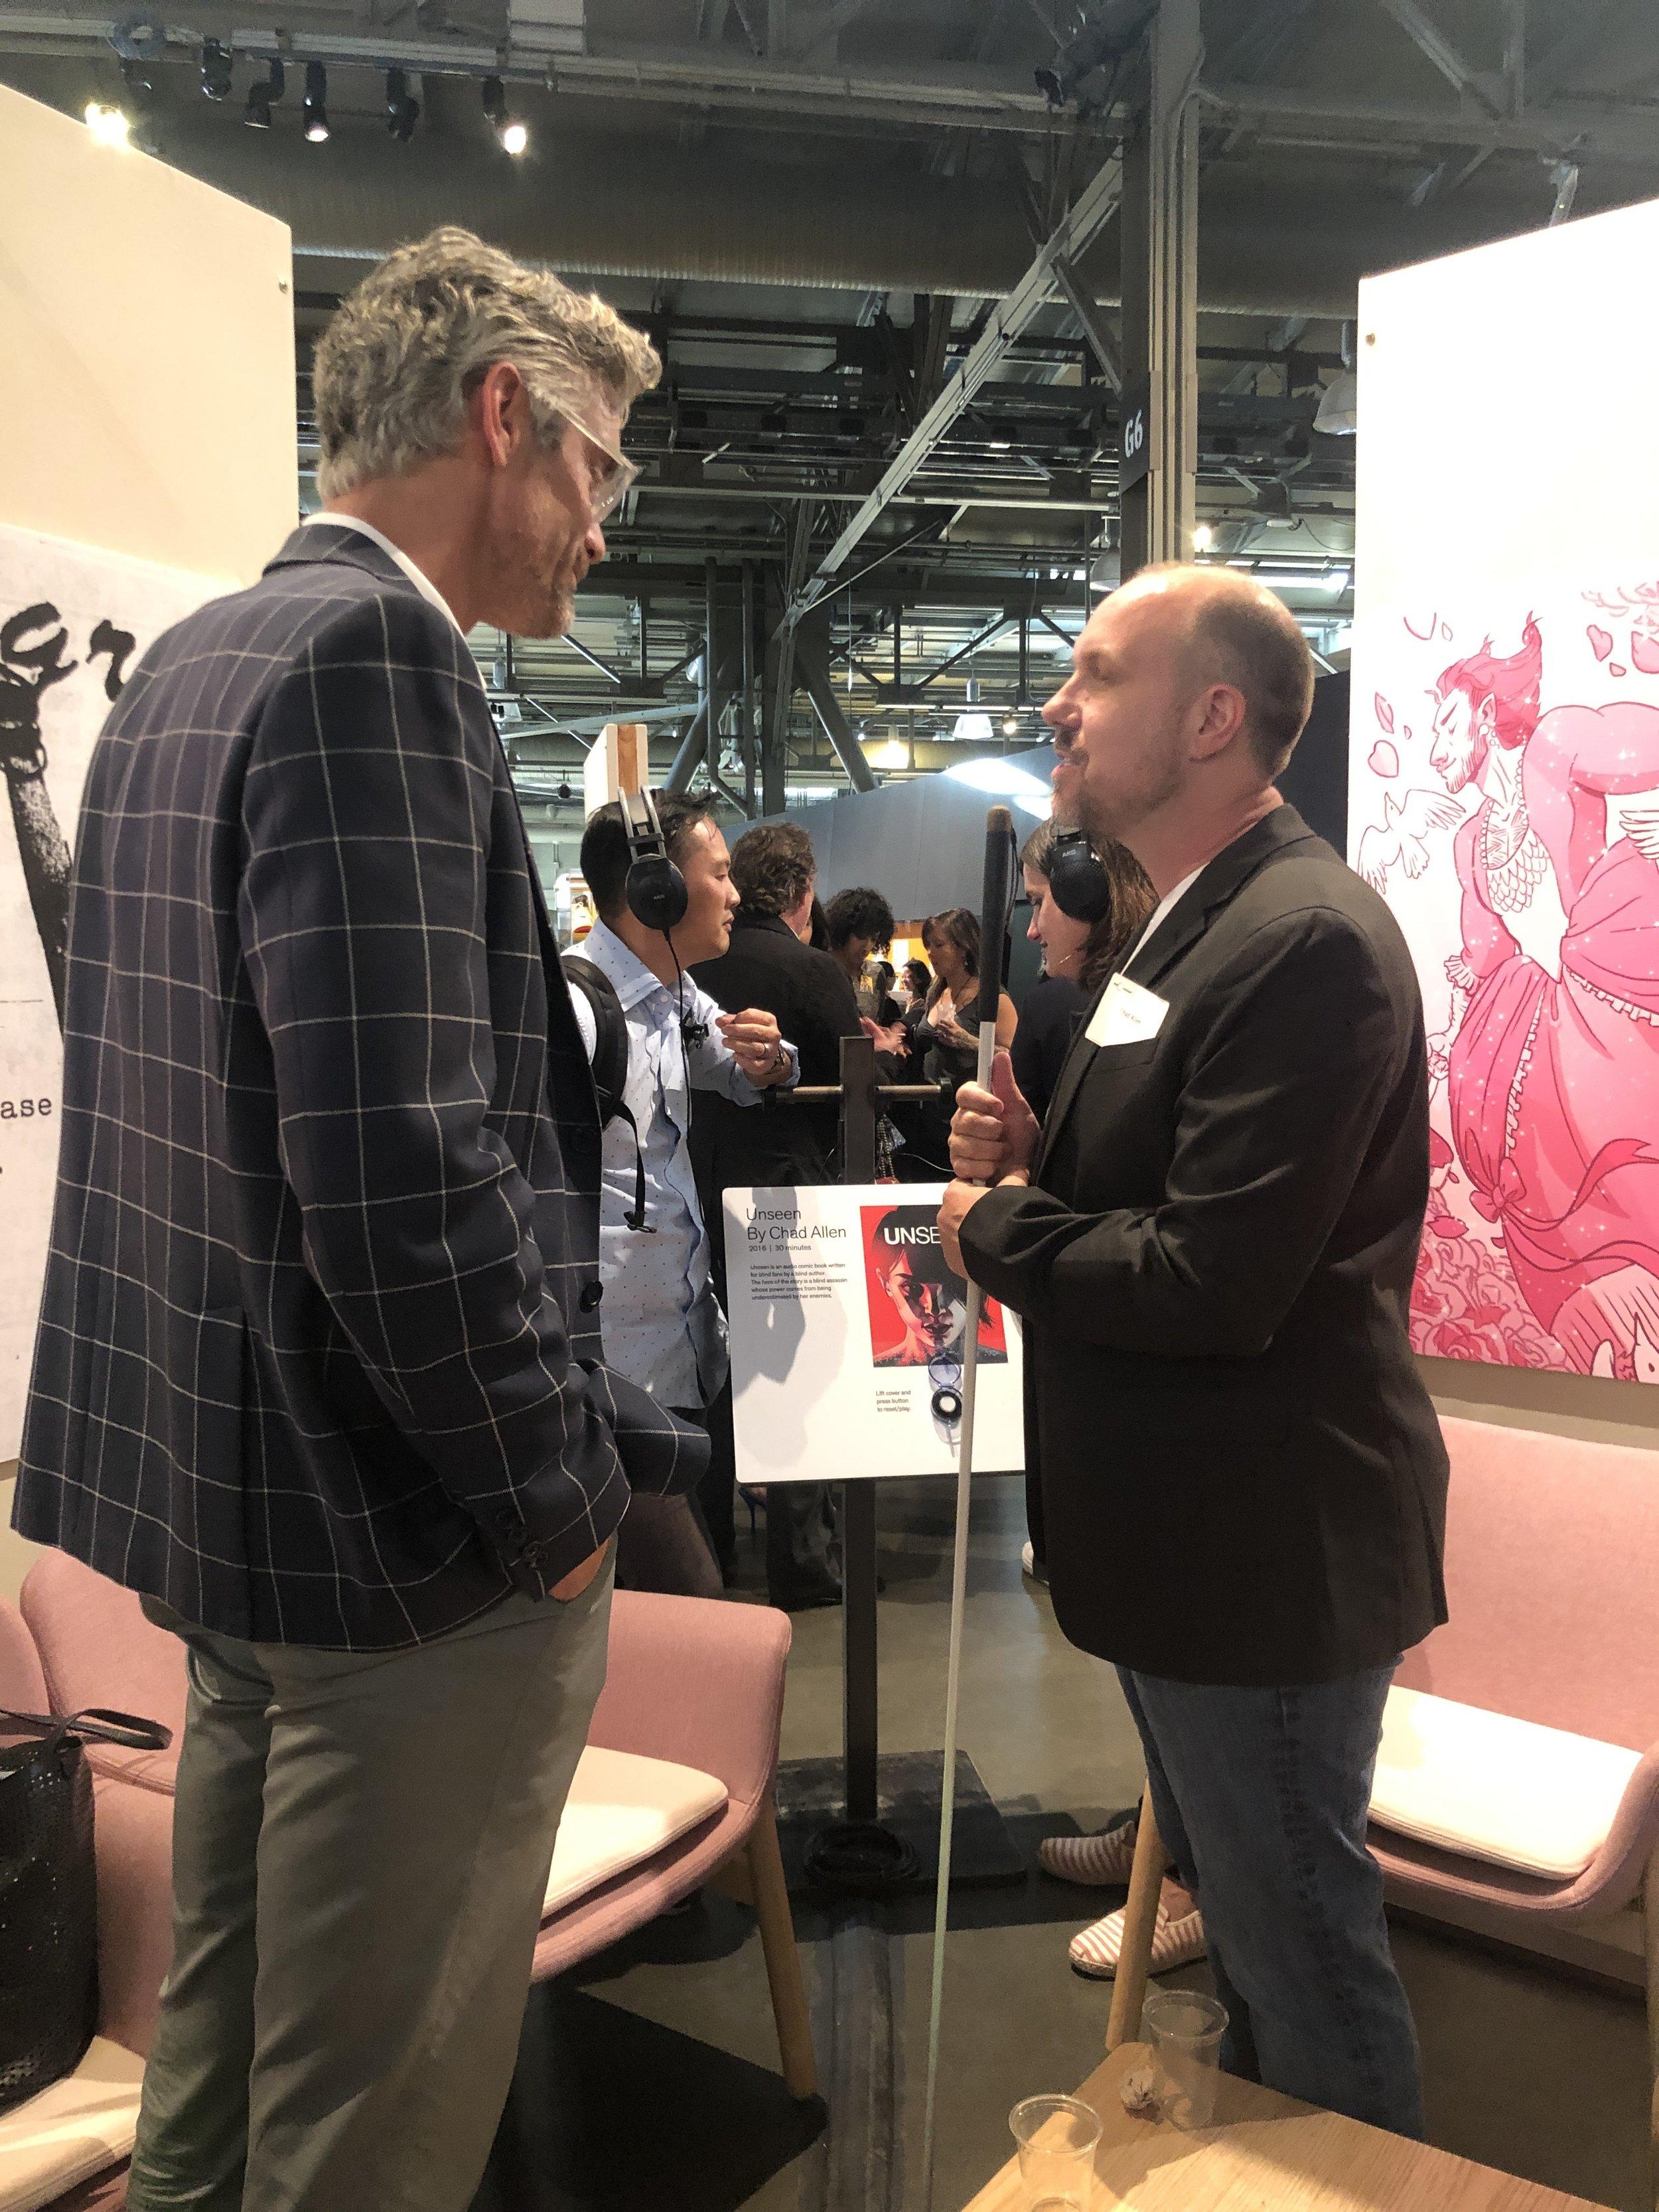 Chad Allen, author talking with Chris Flint, Executive Director of the Exploratorium